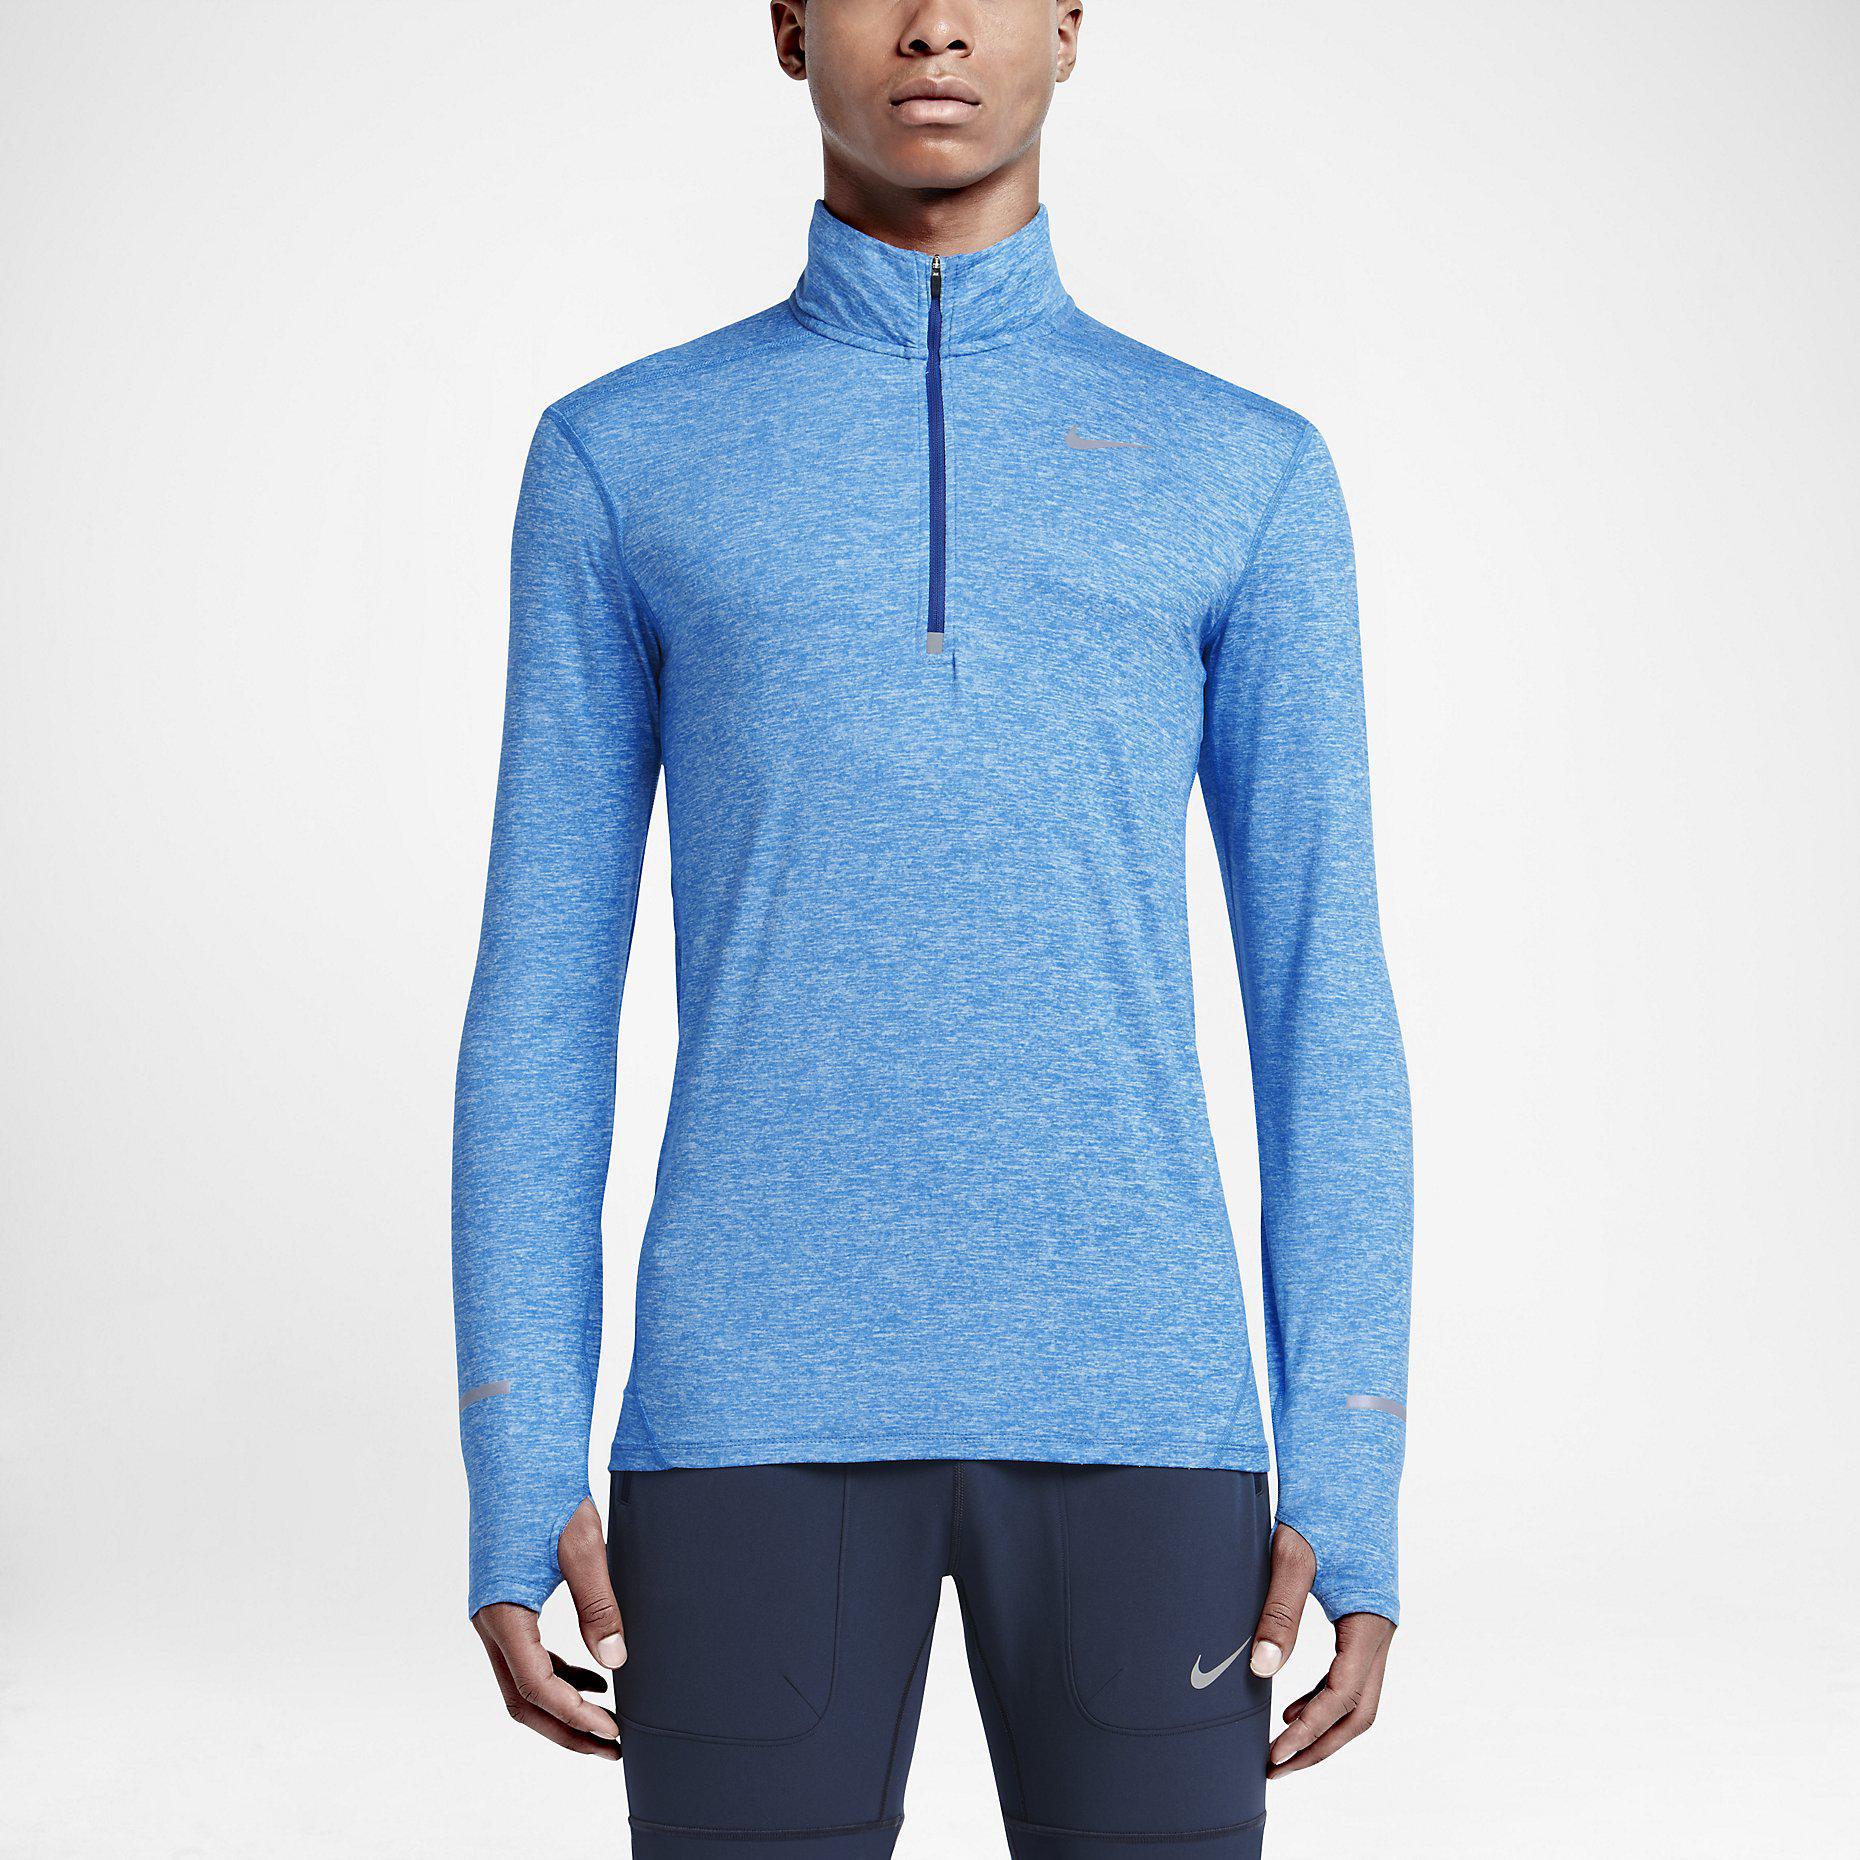 Nike Dri Fit Mens T Shirt